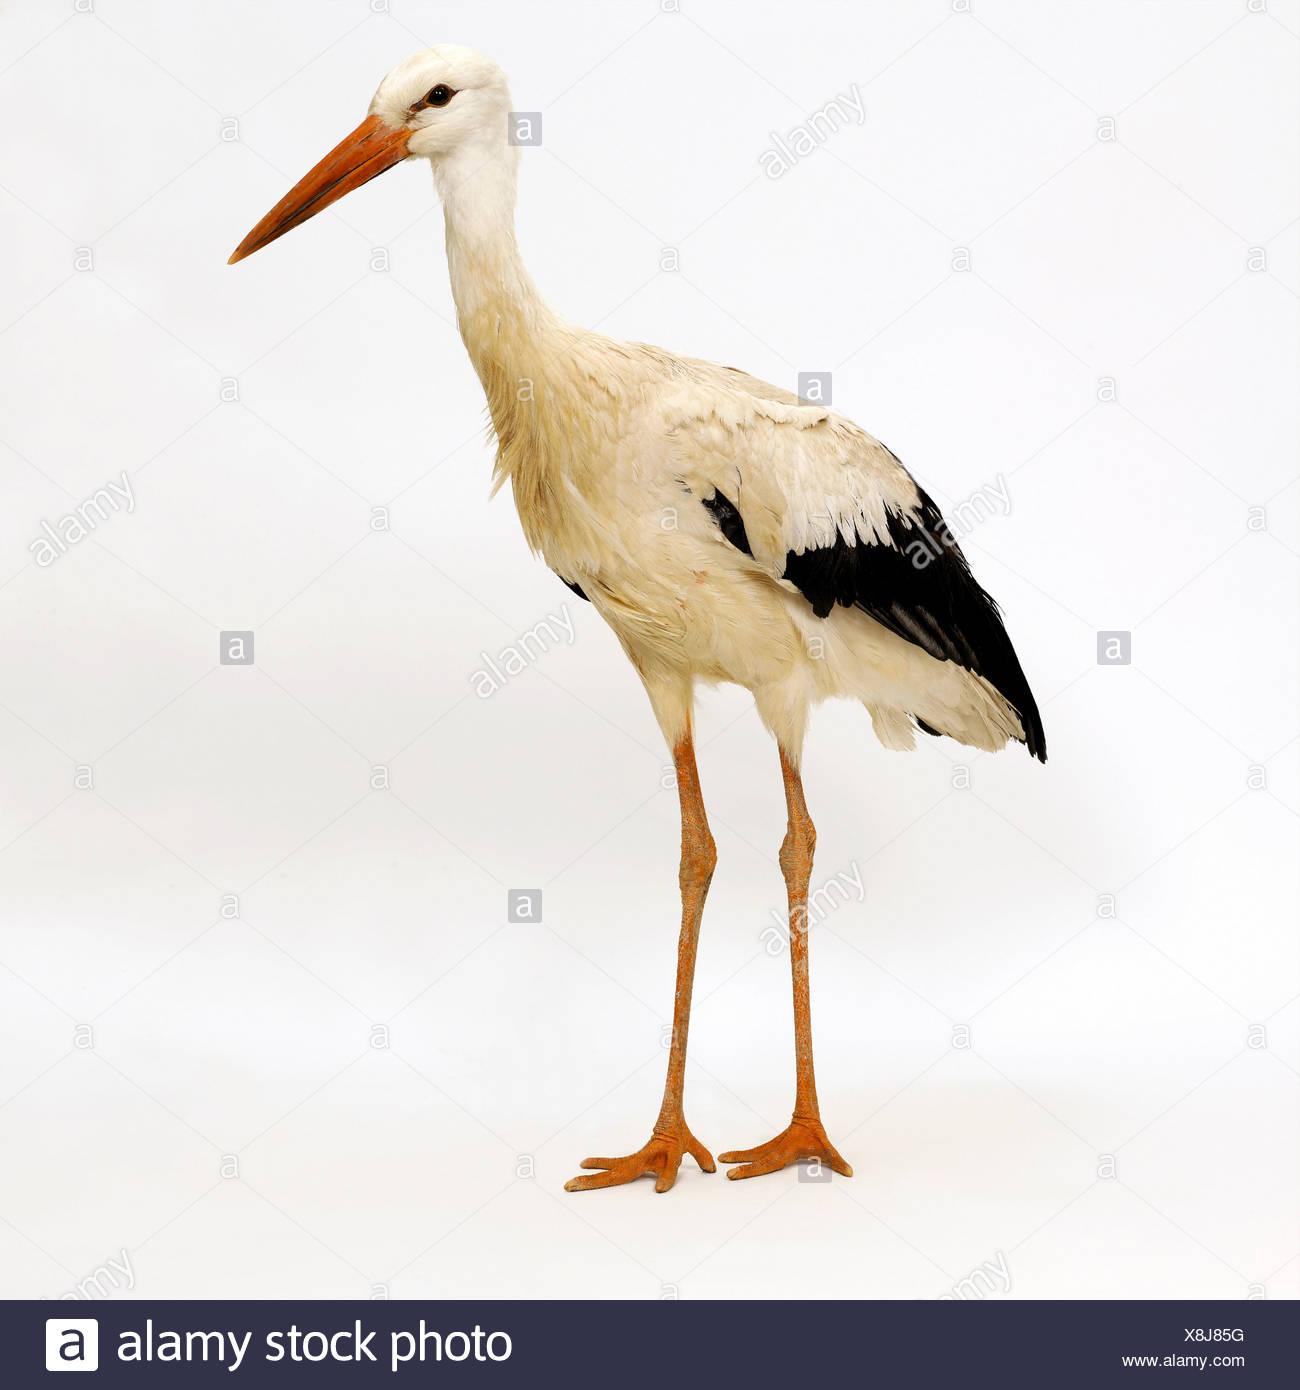 Stork - Stock Image